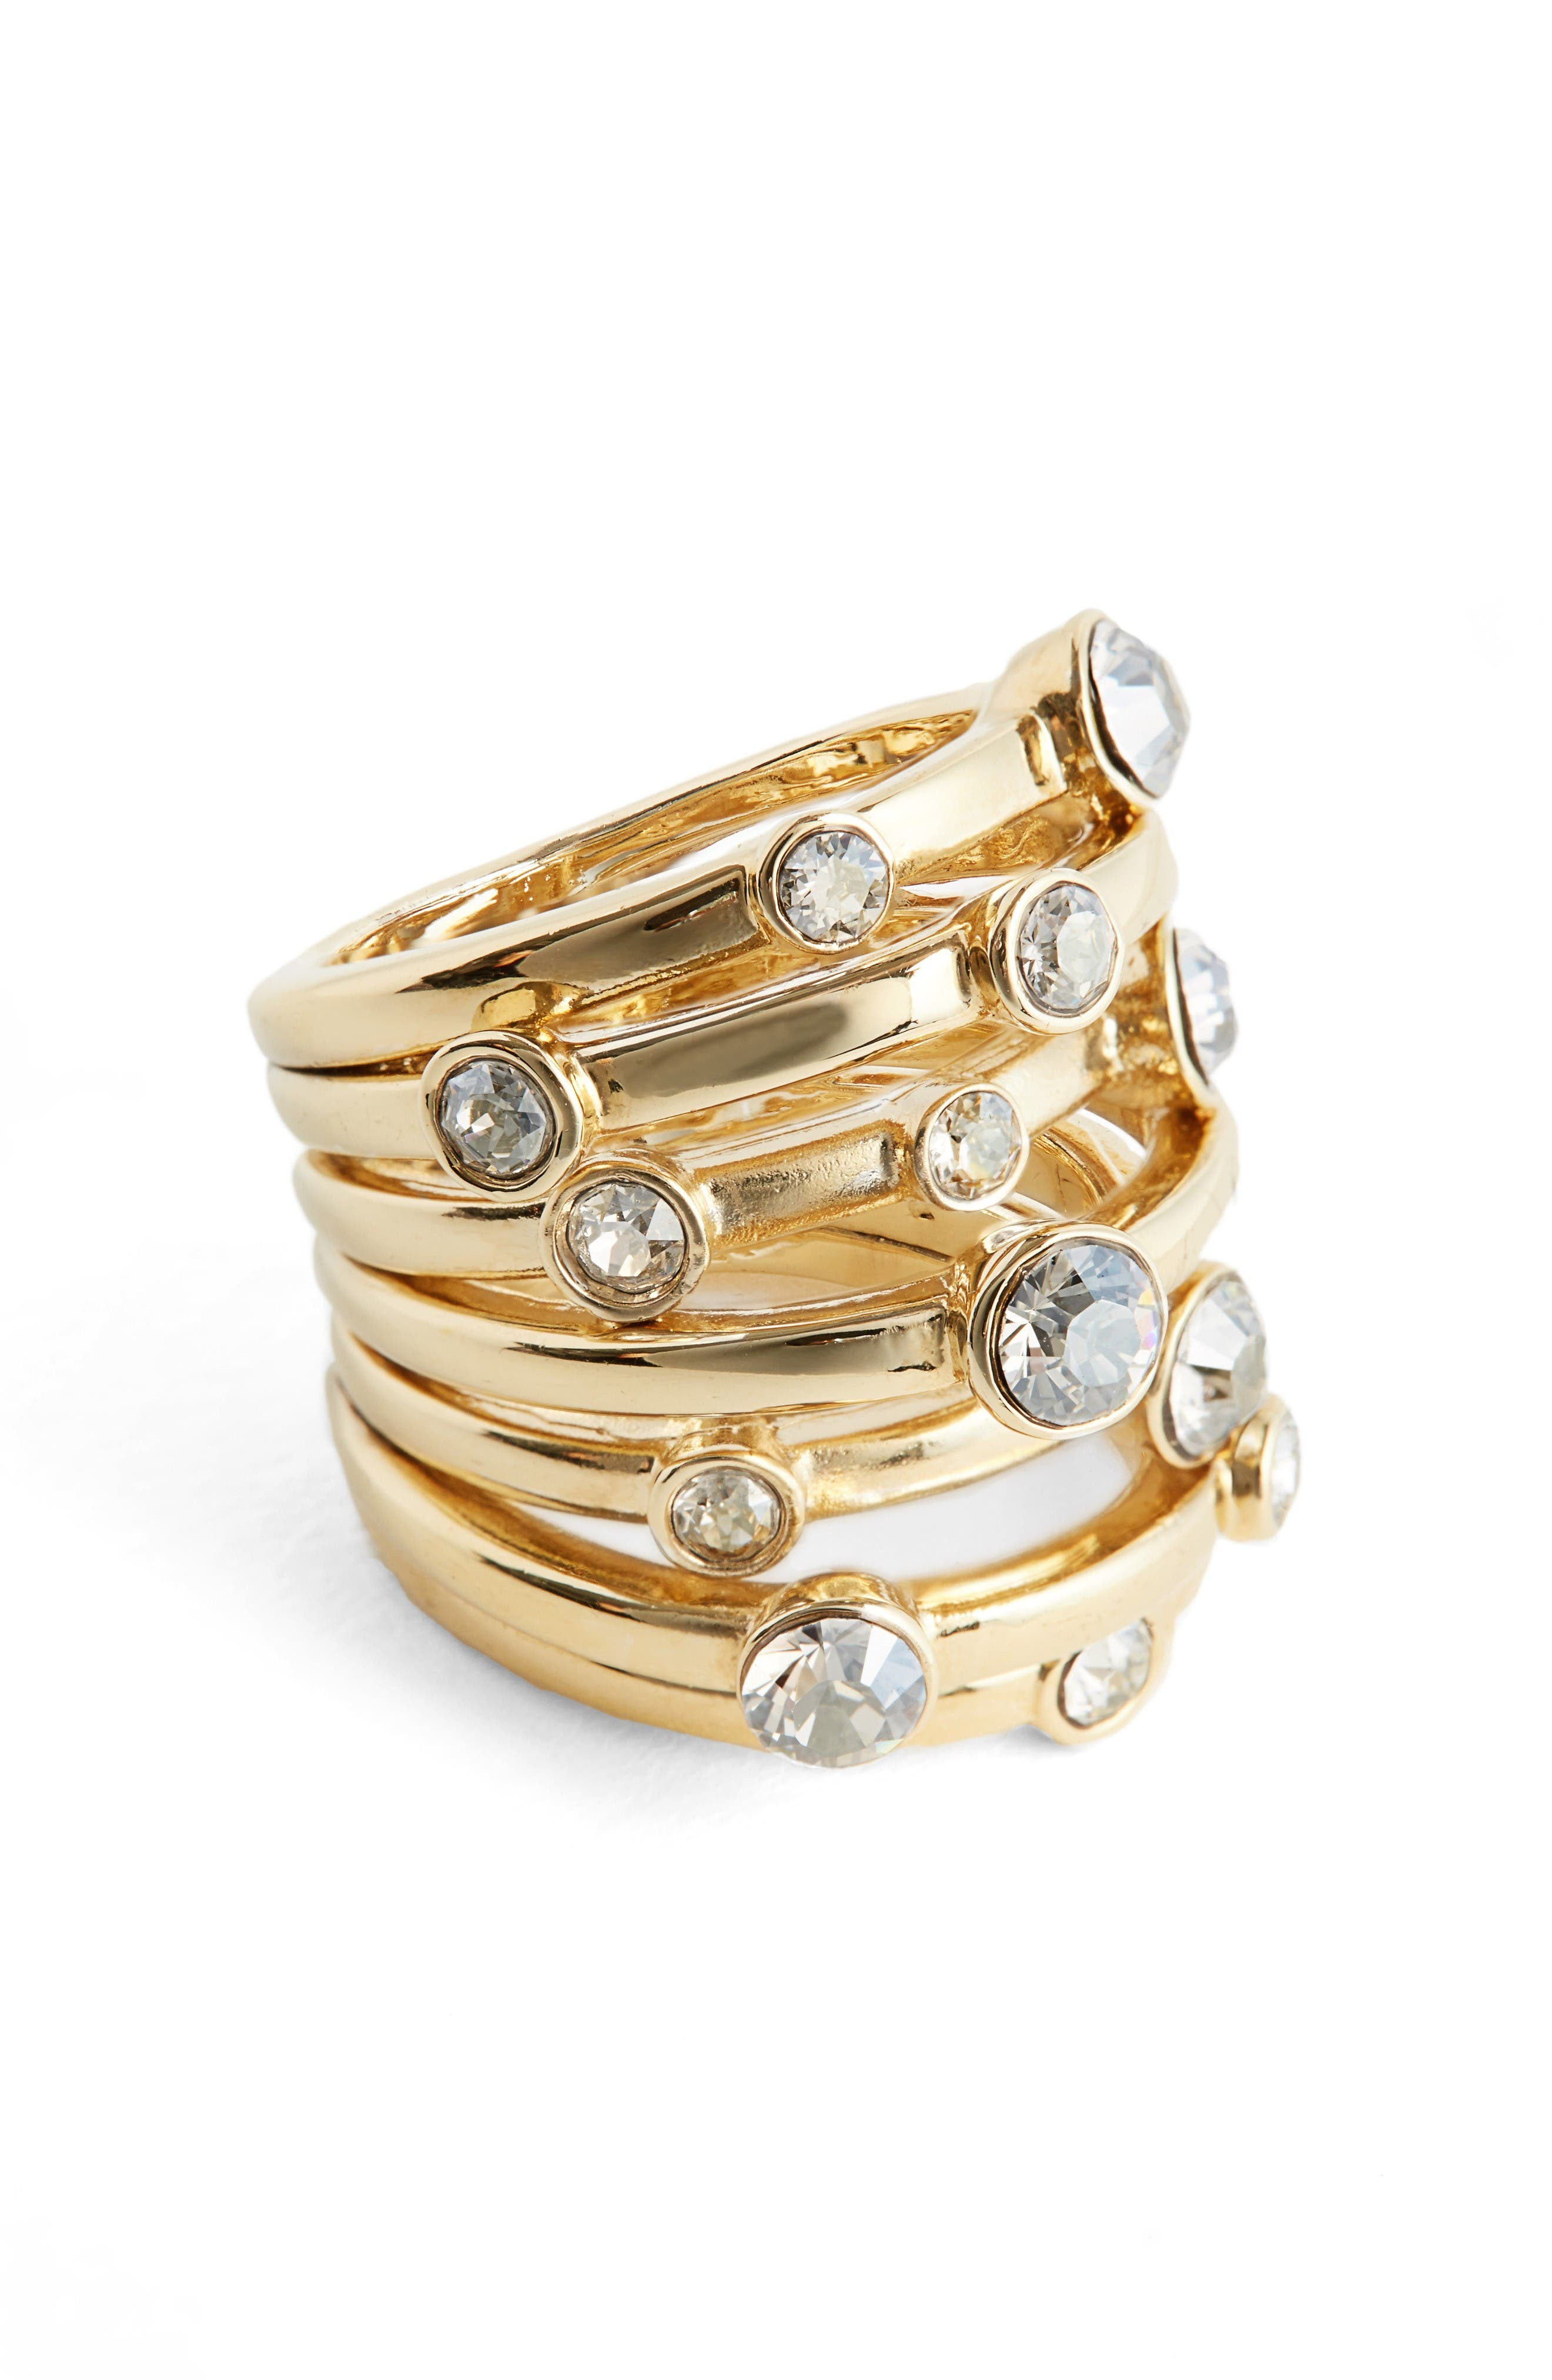 Swarovski Crystal Cocktail Ring,                             Main thumbnail 1, color,                             Light Gold/ Crystal Silver